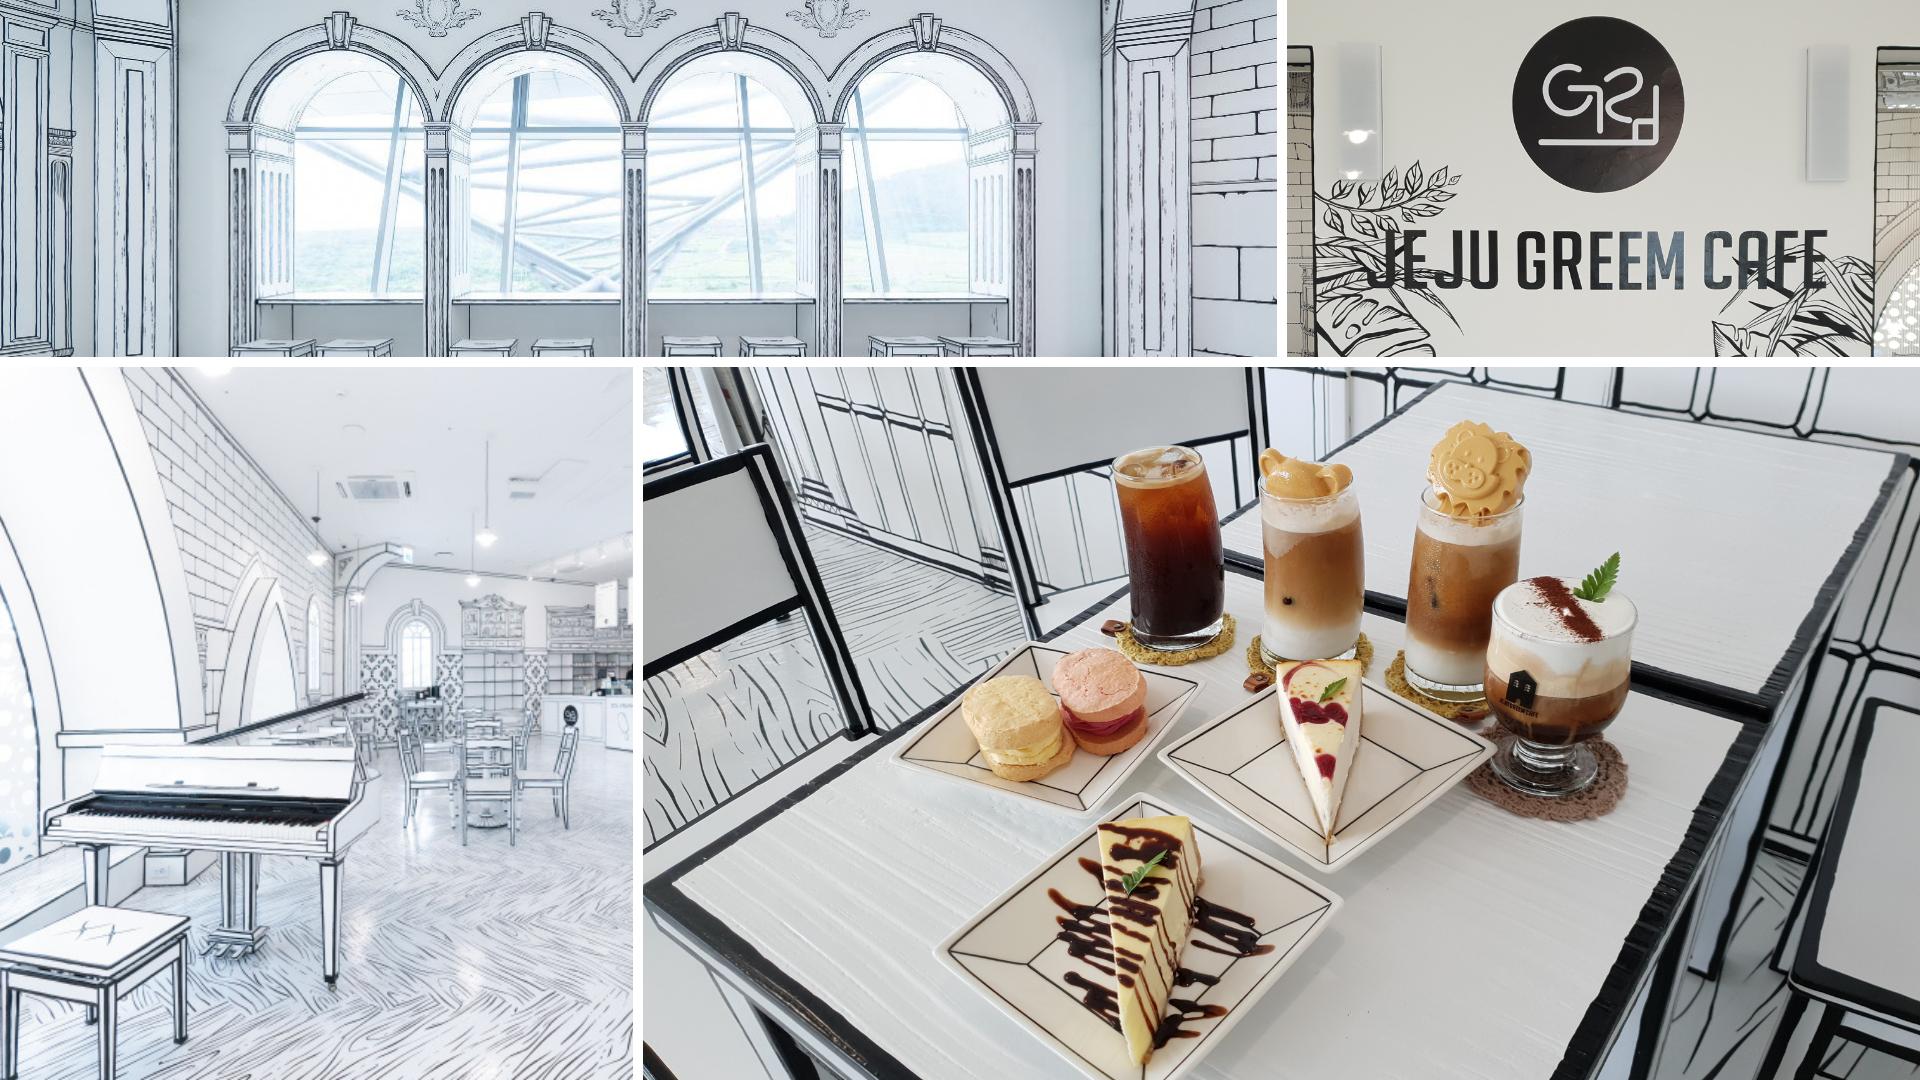 Greem Cafe Jeju South Korea